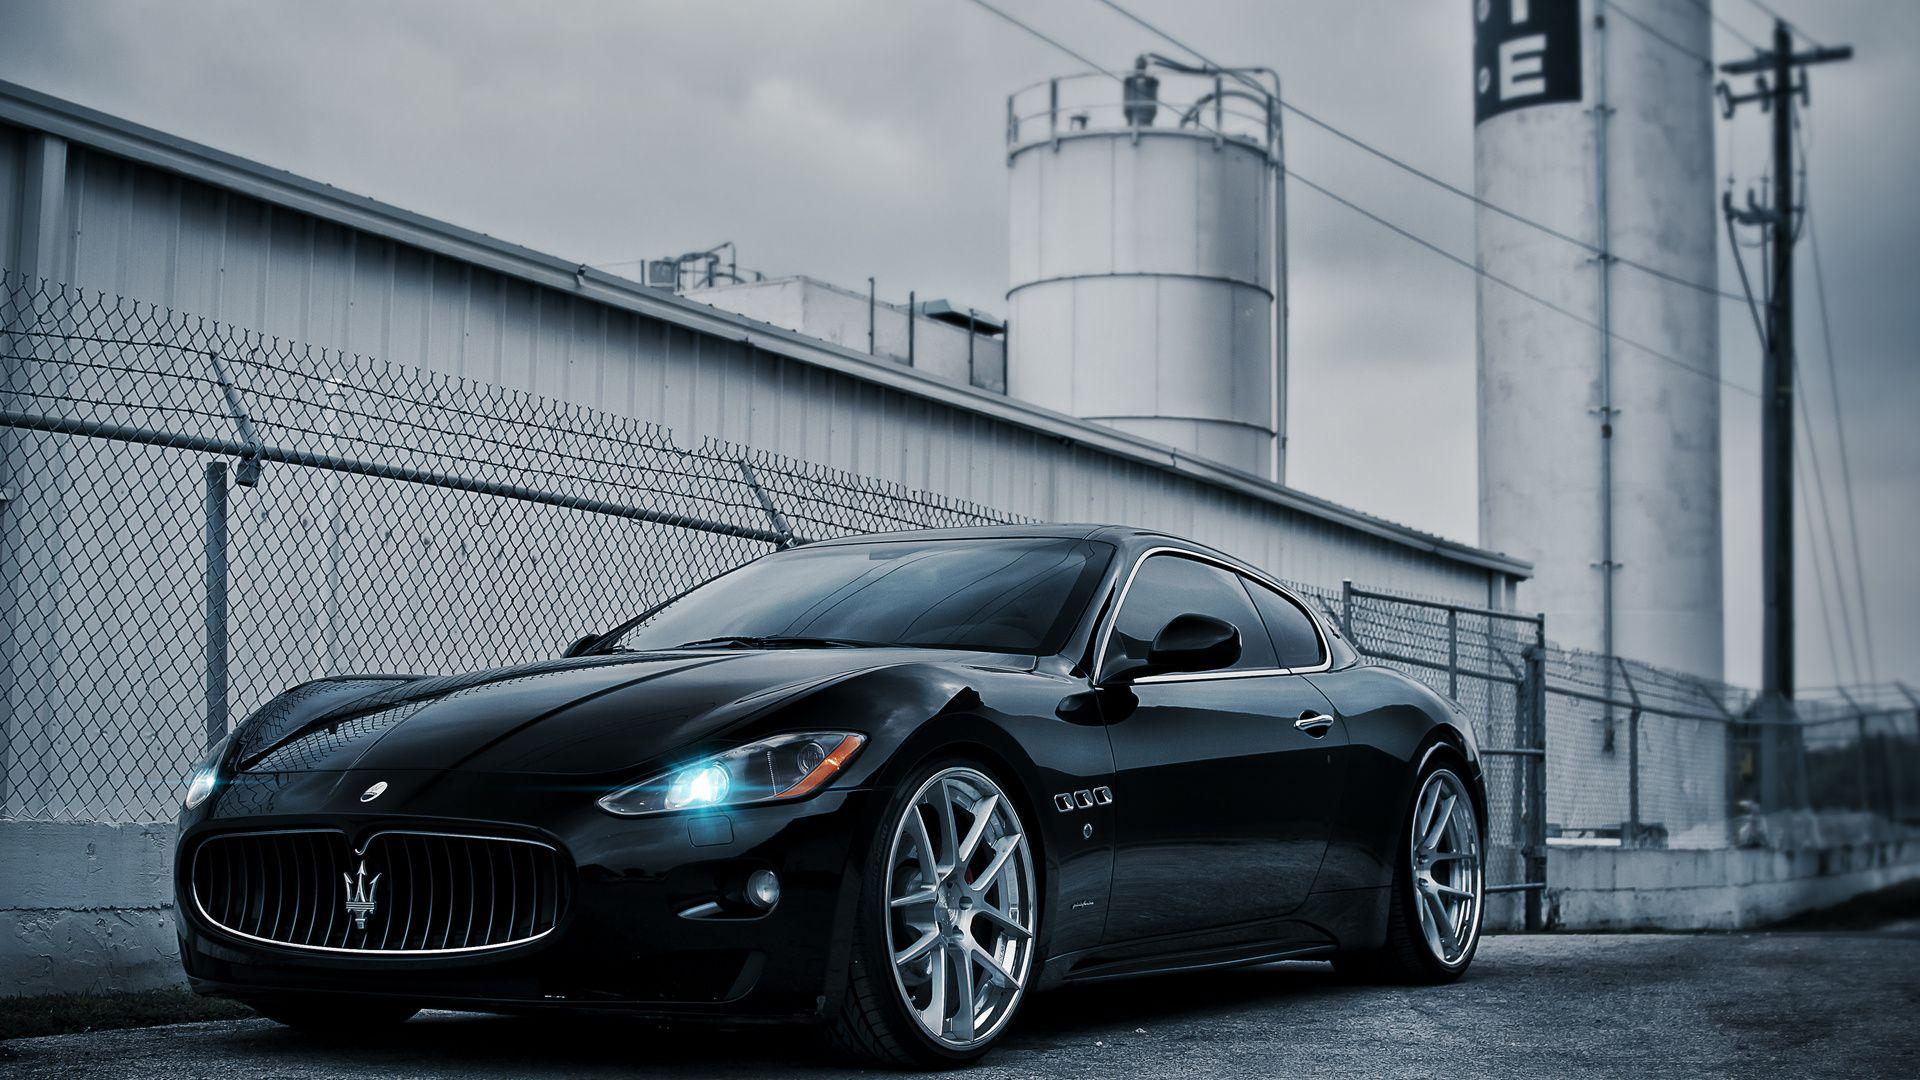 Black Maserati Photos